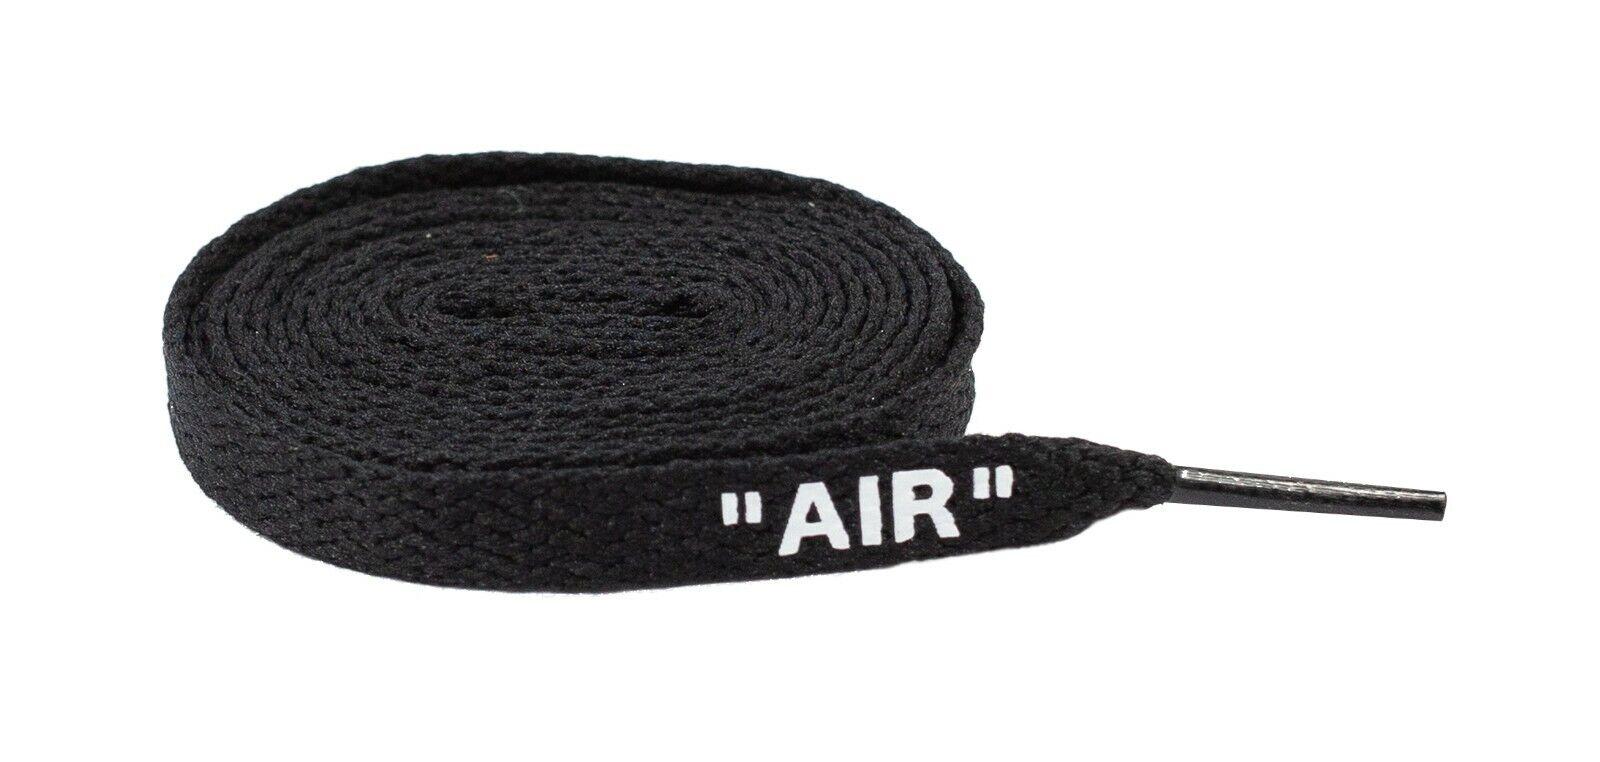 "Premium Flat Sneaker Laces ""Air"" Off White Shoe laces In Black White Lace Envy Clothing & Shoe Care"